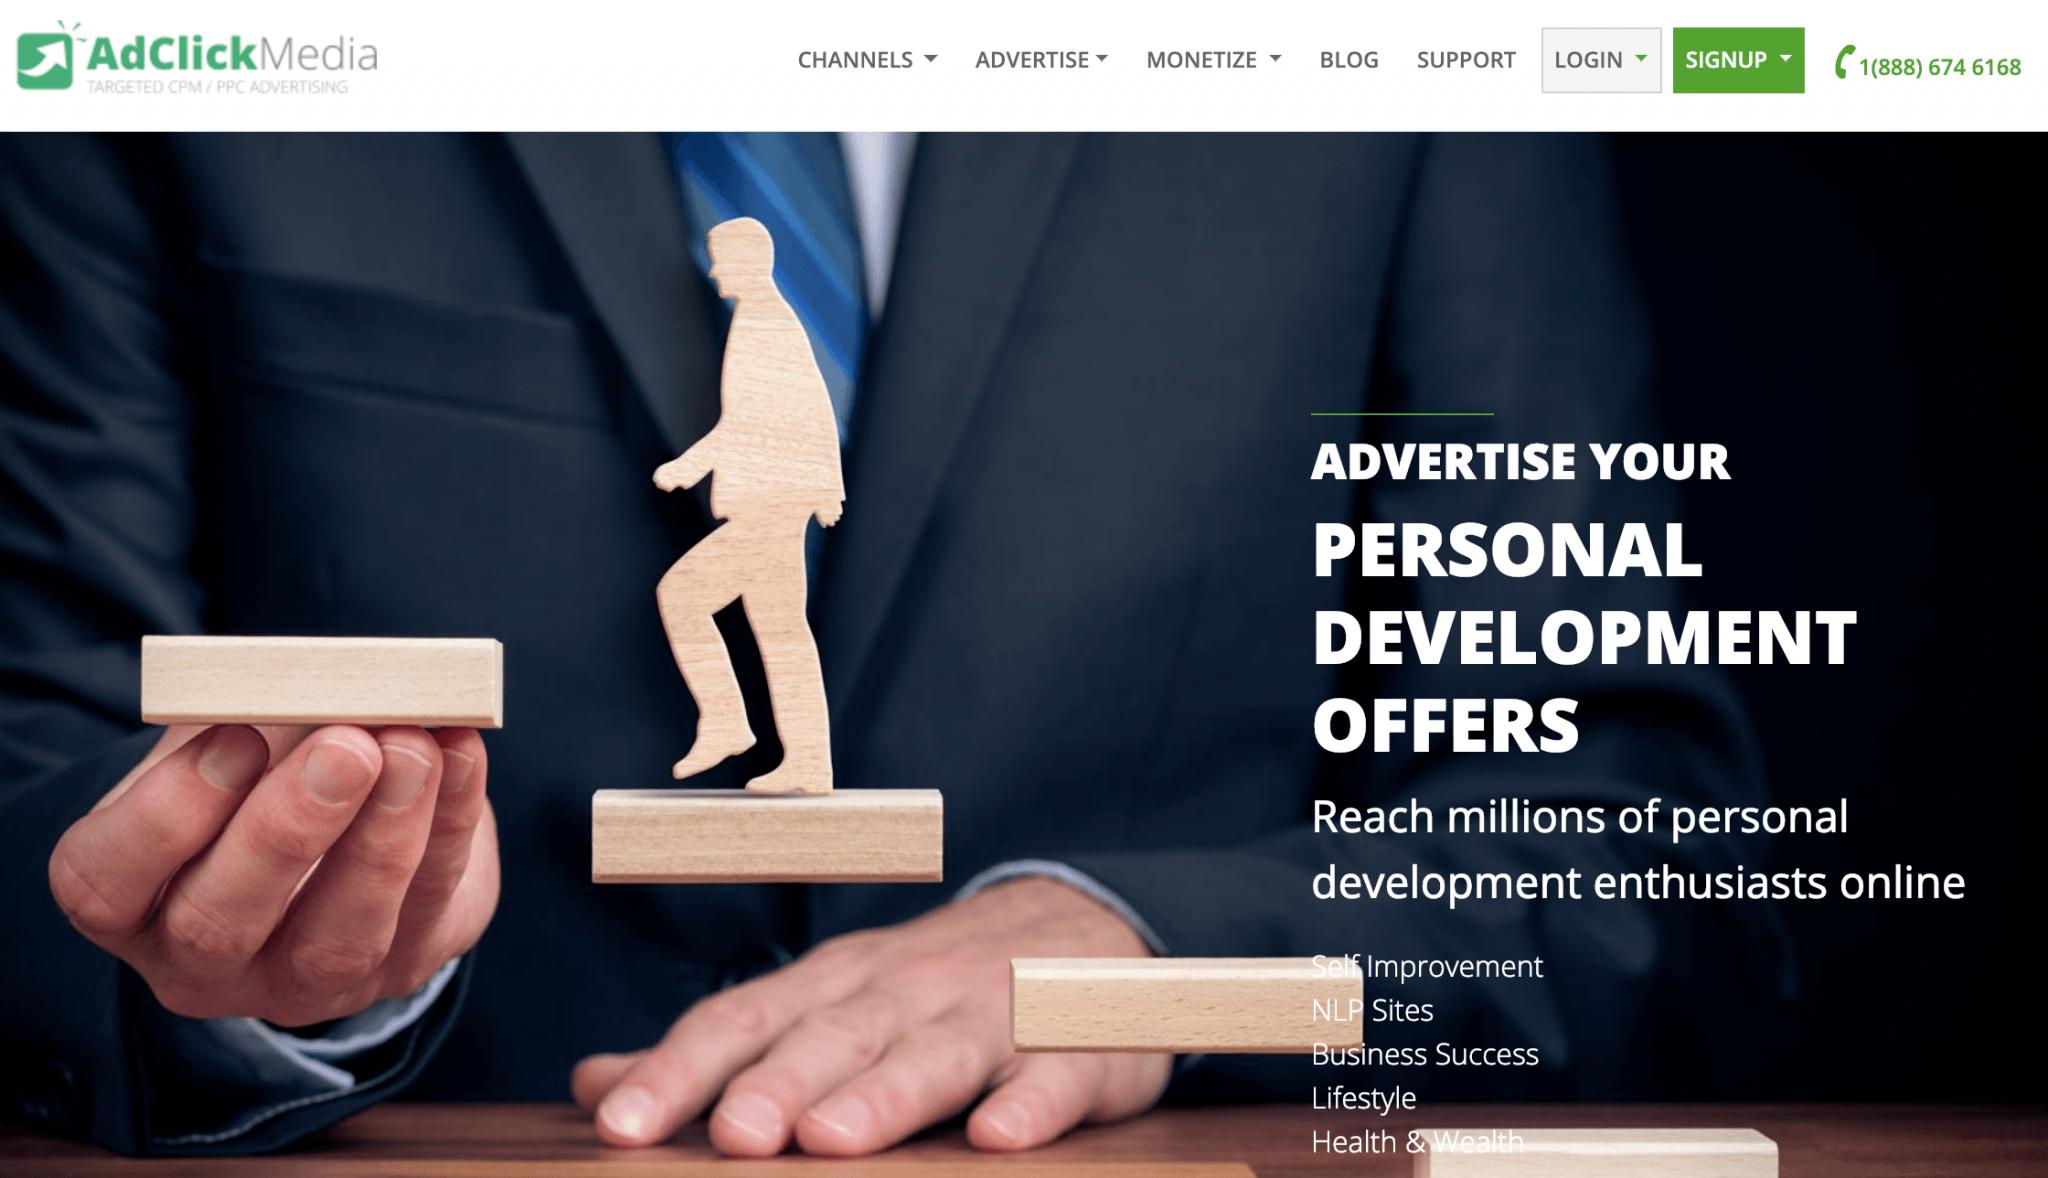 adclickmedia personal development image